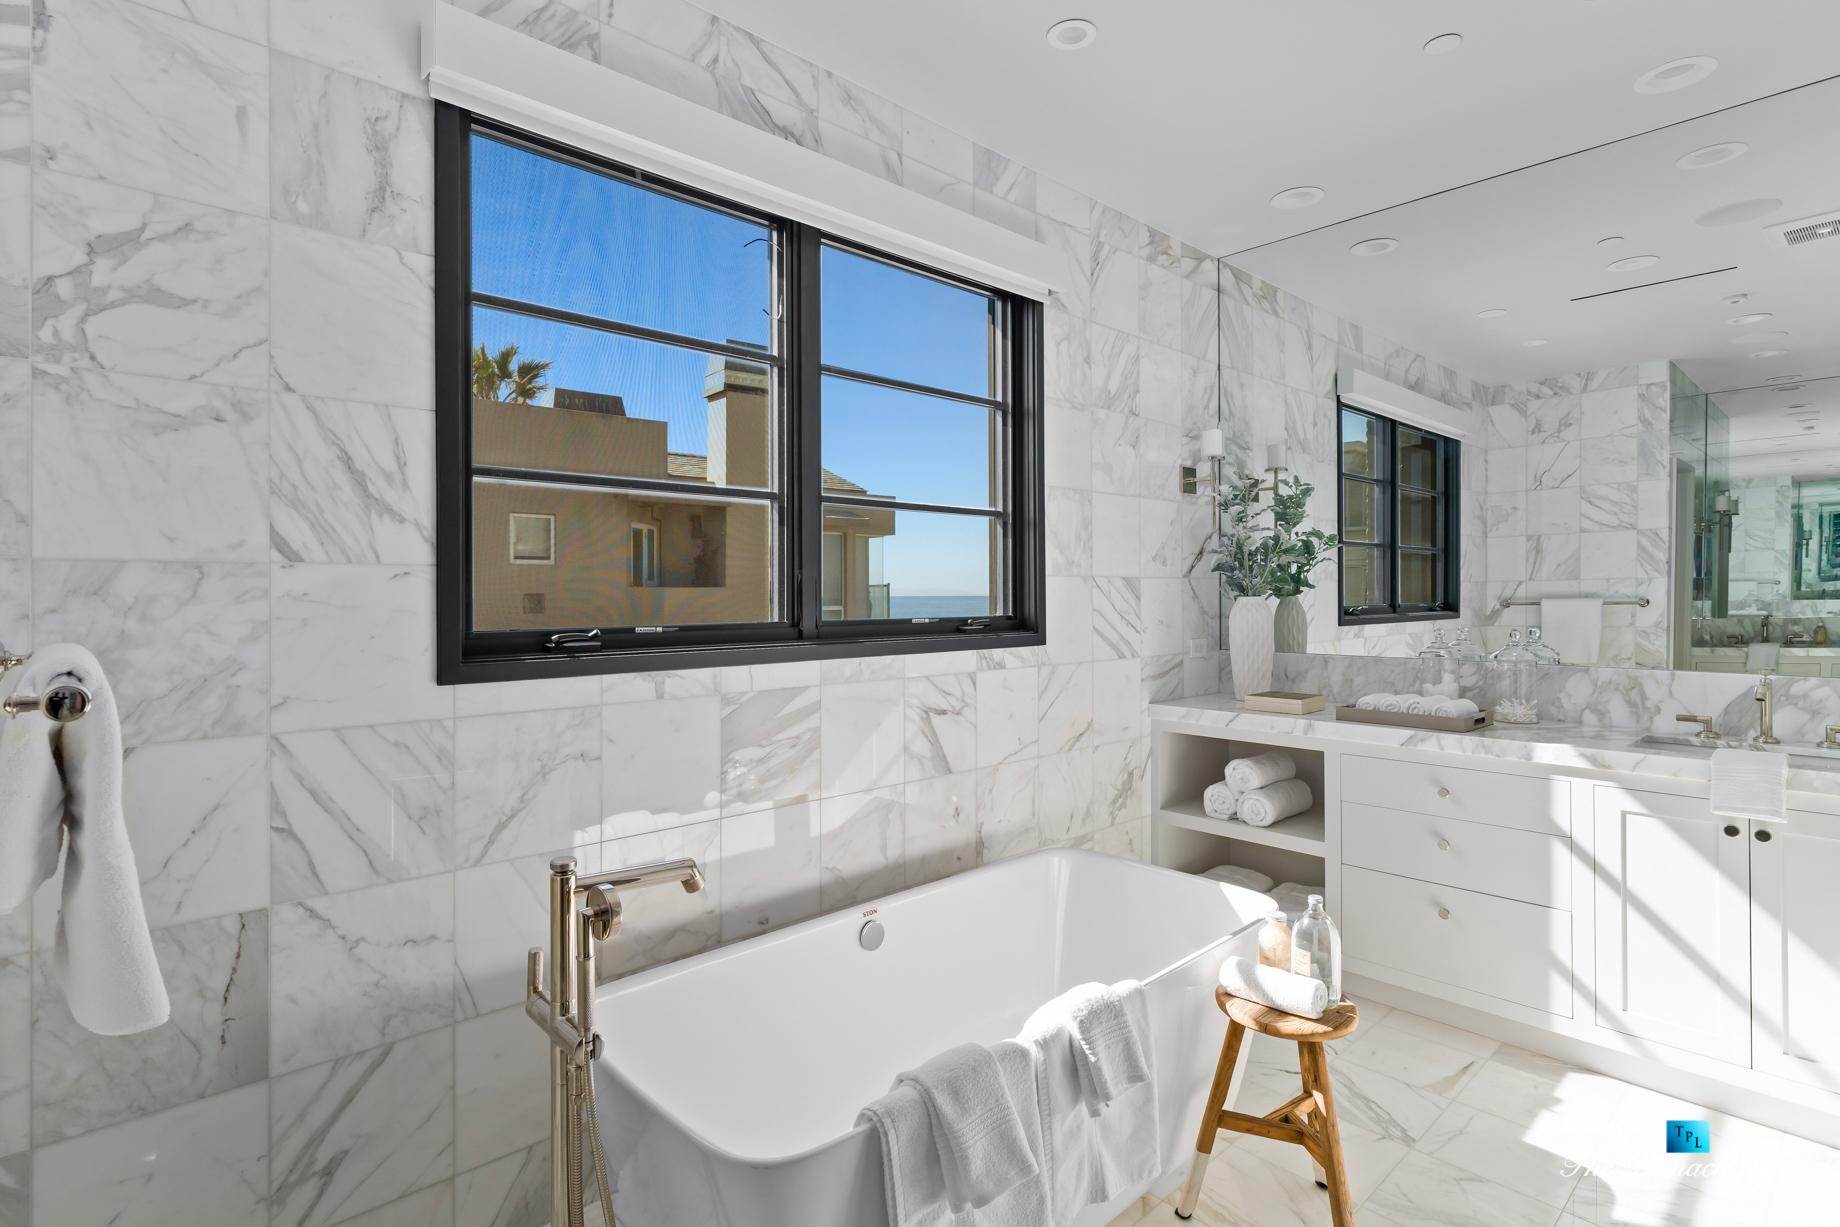 508 The Strand, Manhattan Beach, CA, USA – Master Bathroom Freestanding Tub – Luxury Real Estate – Oceanfront Home